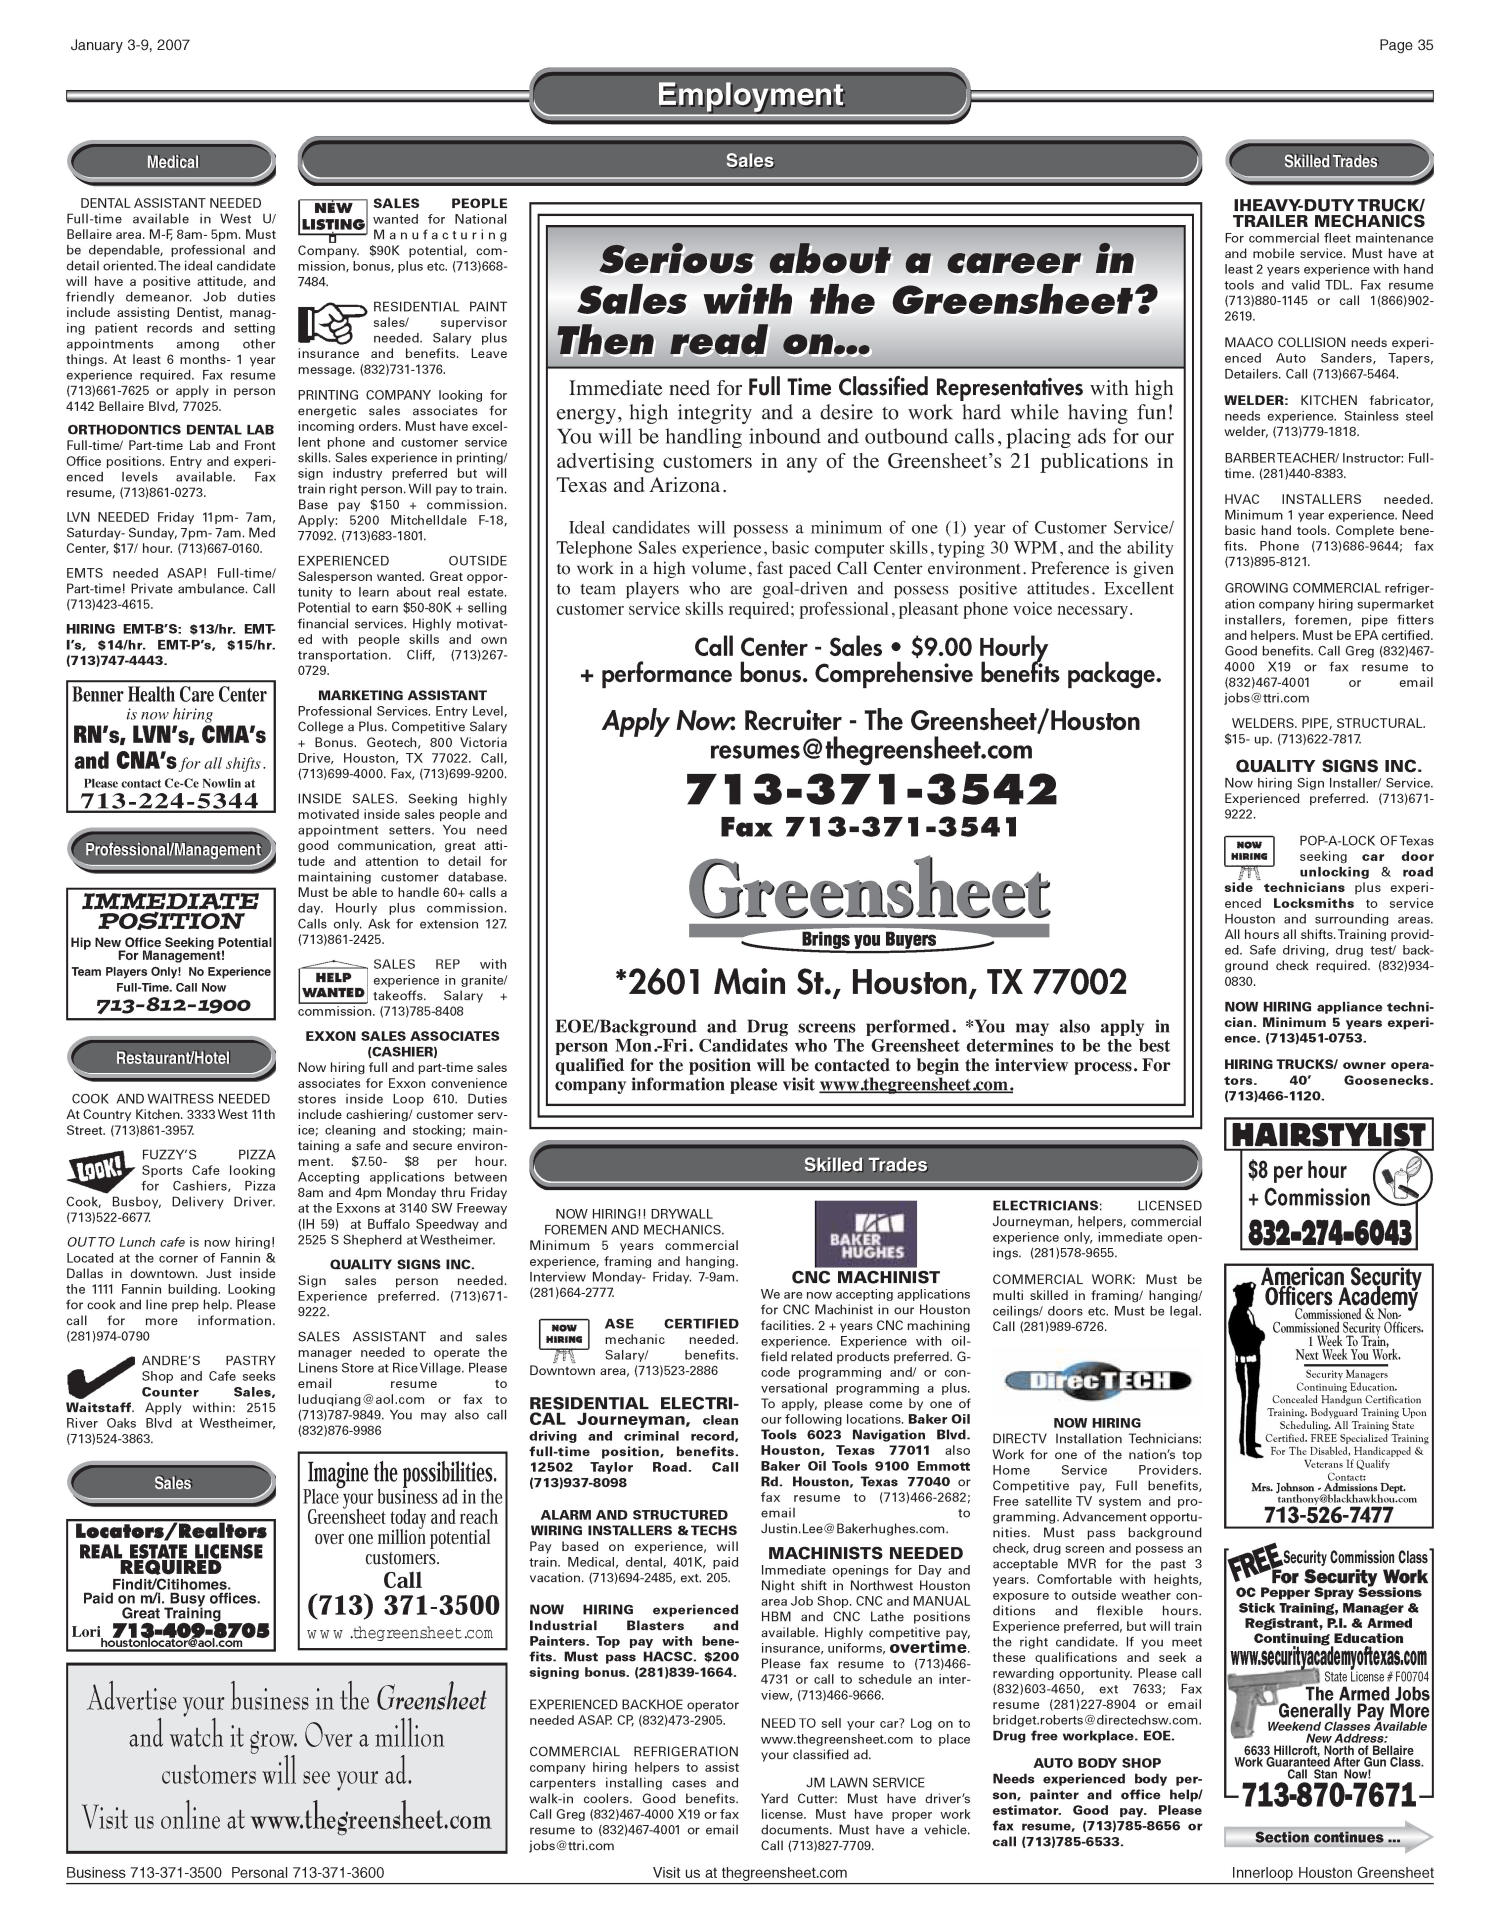 Greensheet Houston Tex Vol 37 No 568 Ed 1 Wednesday